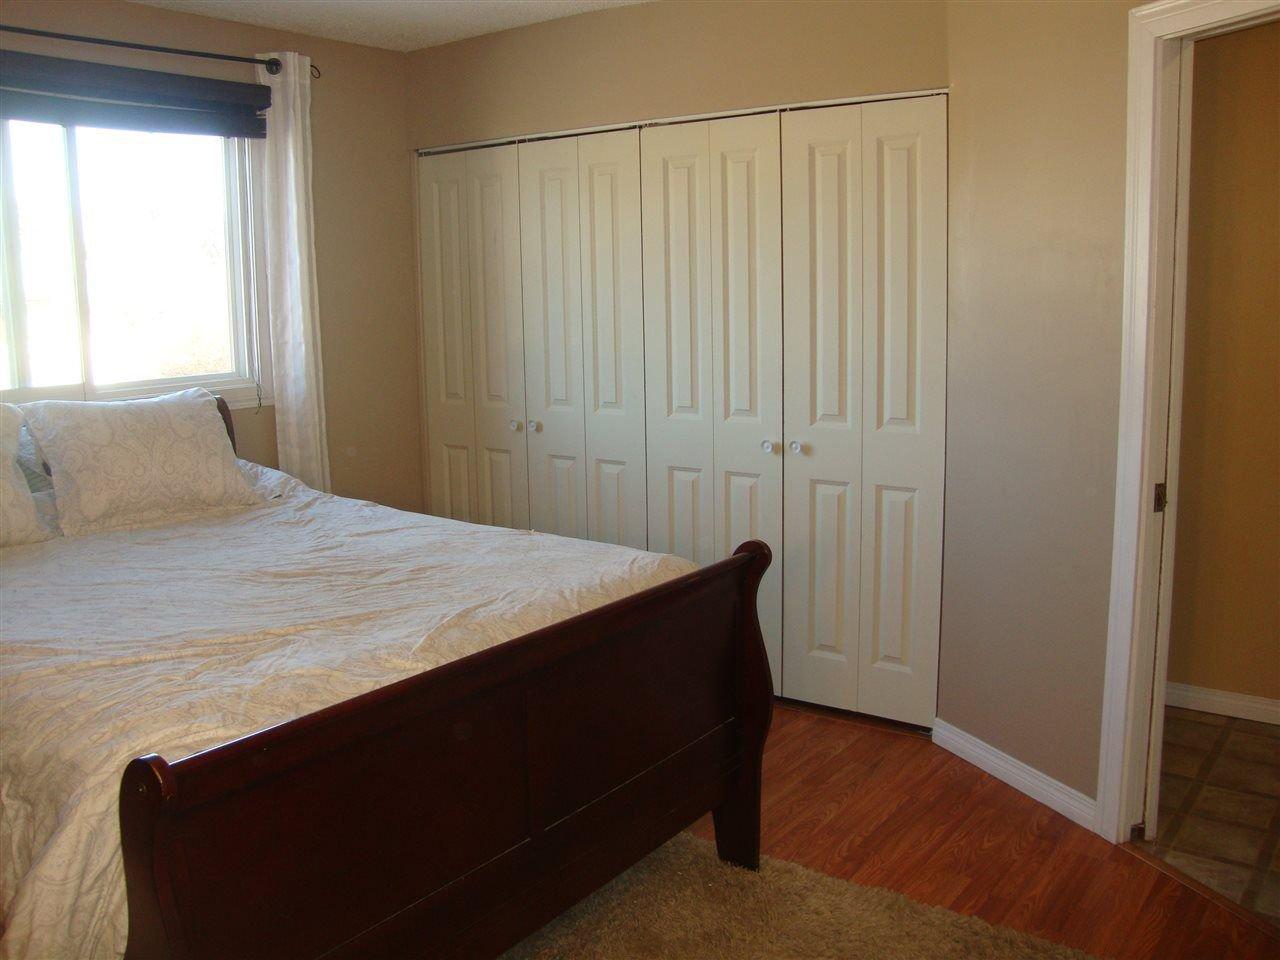 Photo 18: Photos: 4711 51A Avenue: Bon Accord House for sale : MLS®# E4149195